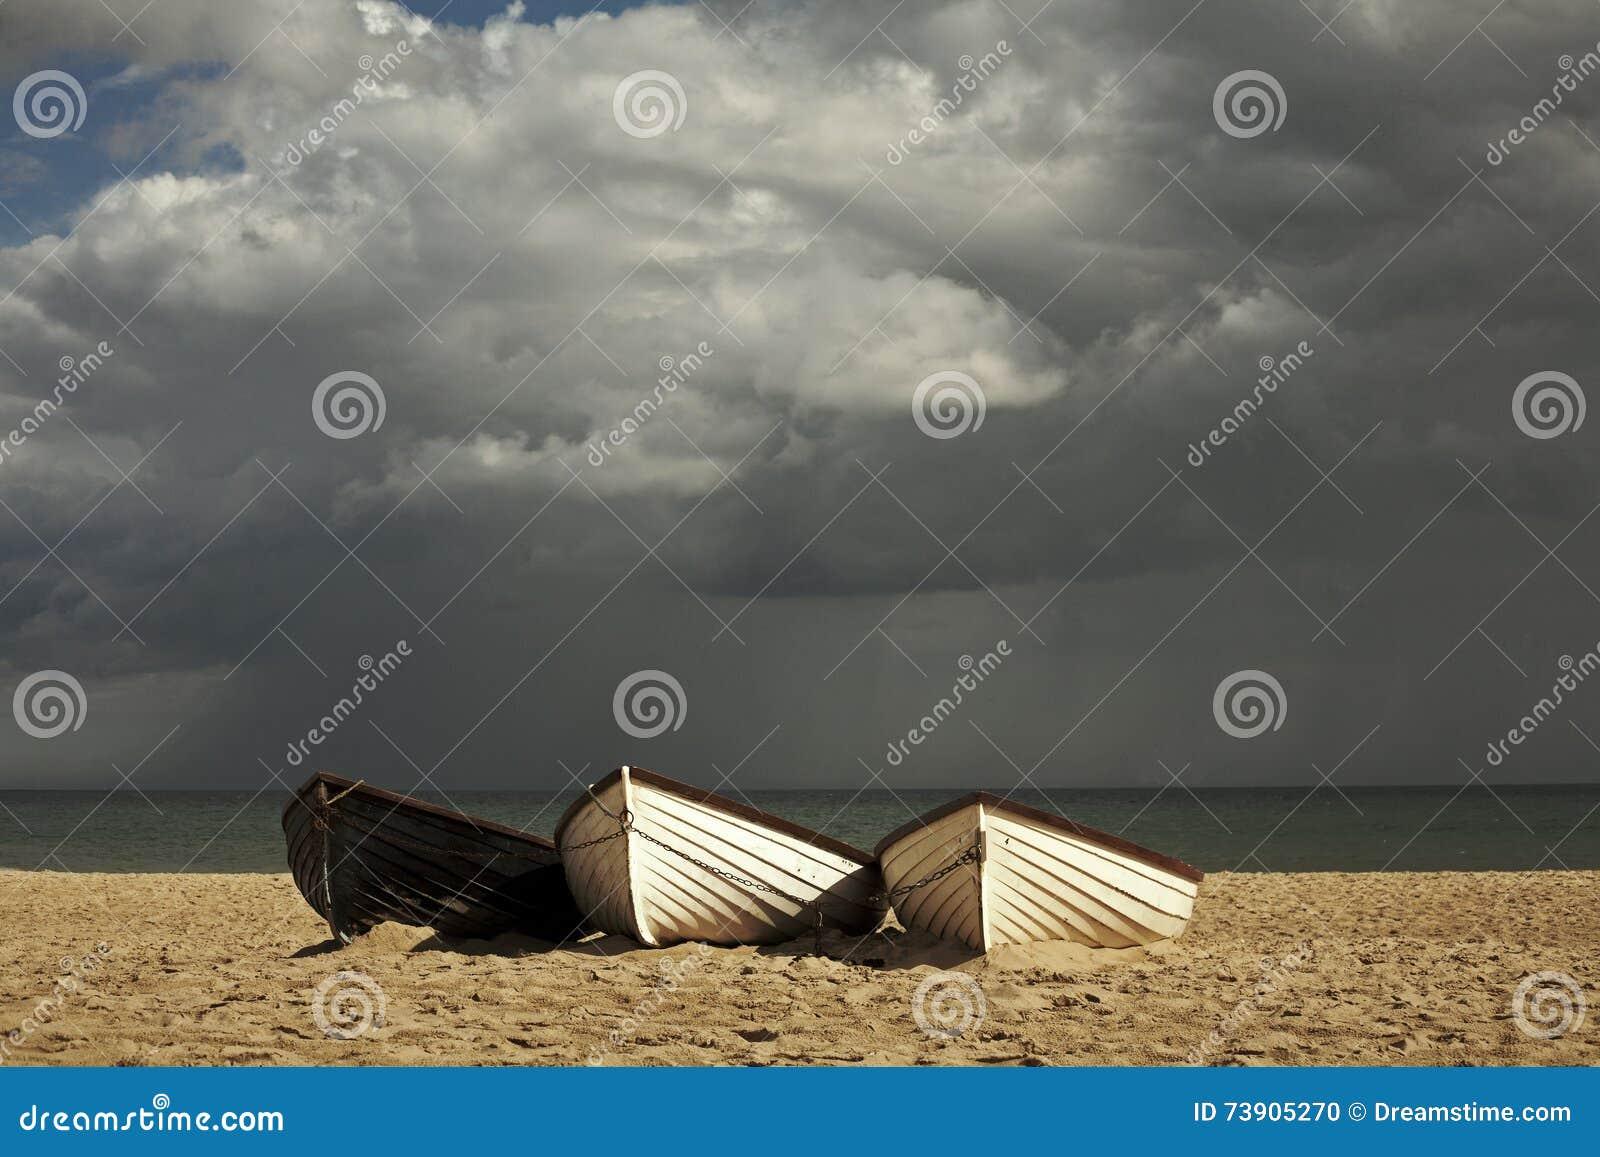 Weather in veliky novgorod dating 9